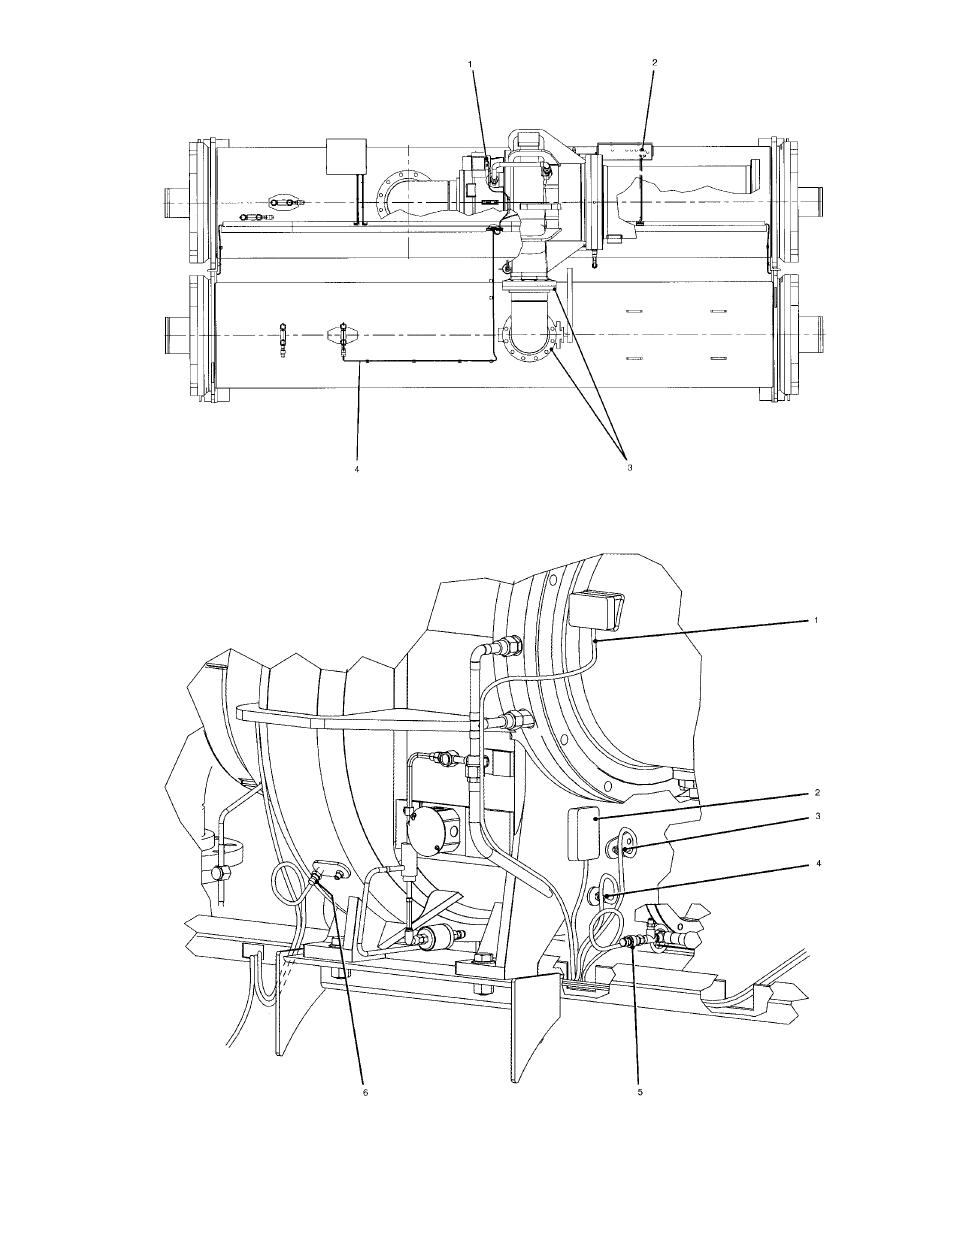 Fig. 7 — 19xr chiller top view, Fig. 8 — compressor detail